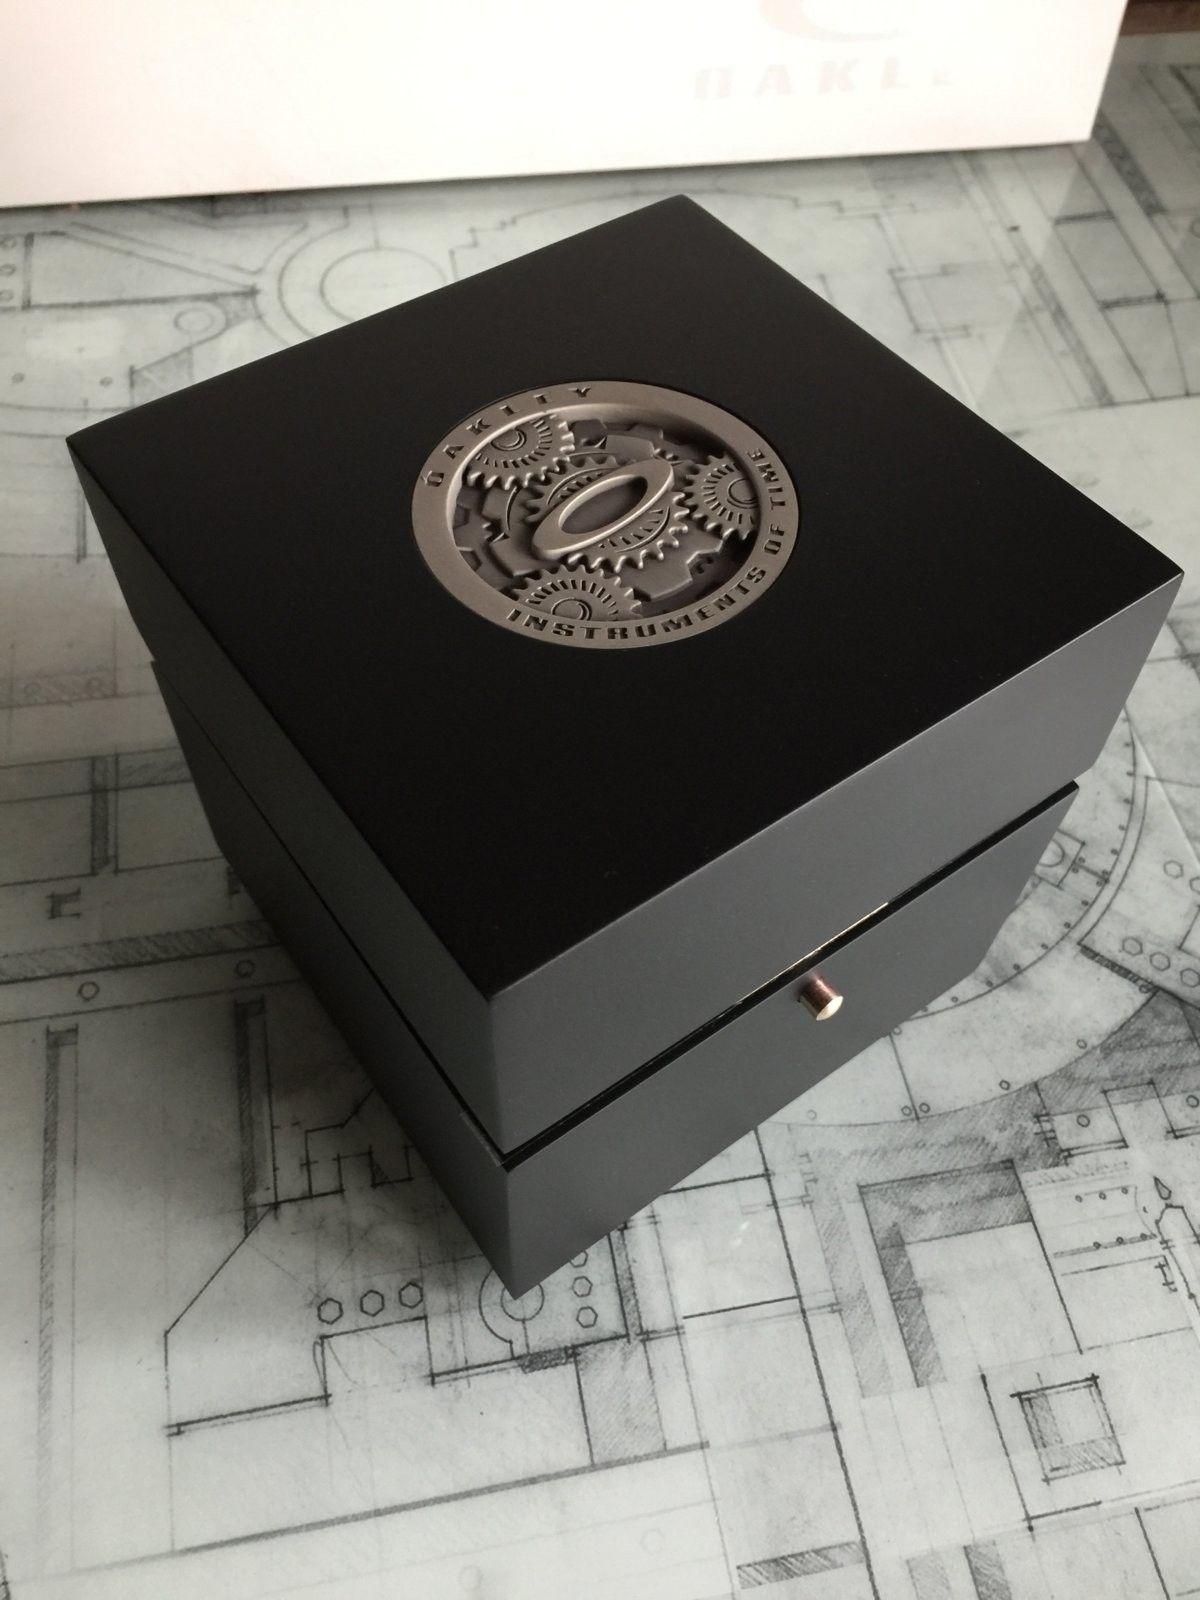 LNIB Polished Black Dial Minute Machine watch - IMG_6083.JPG